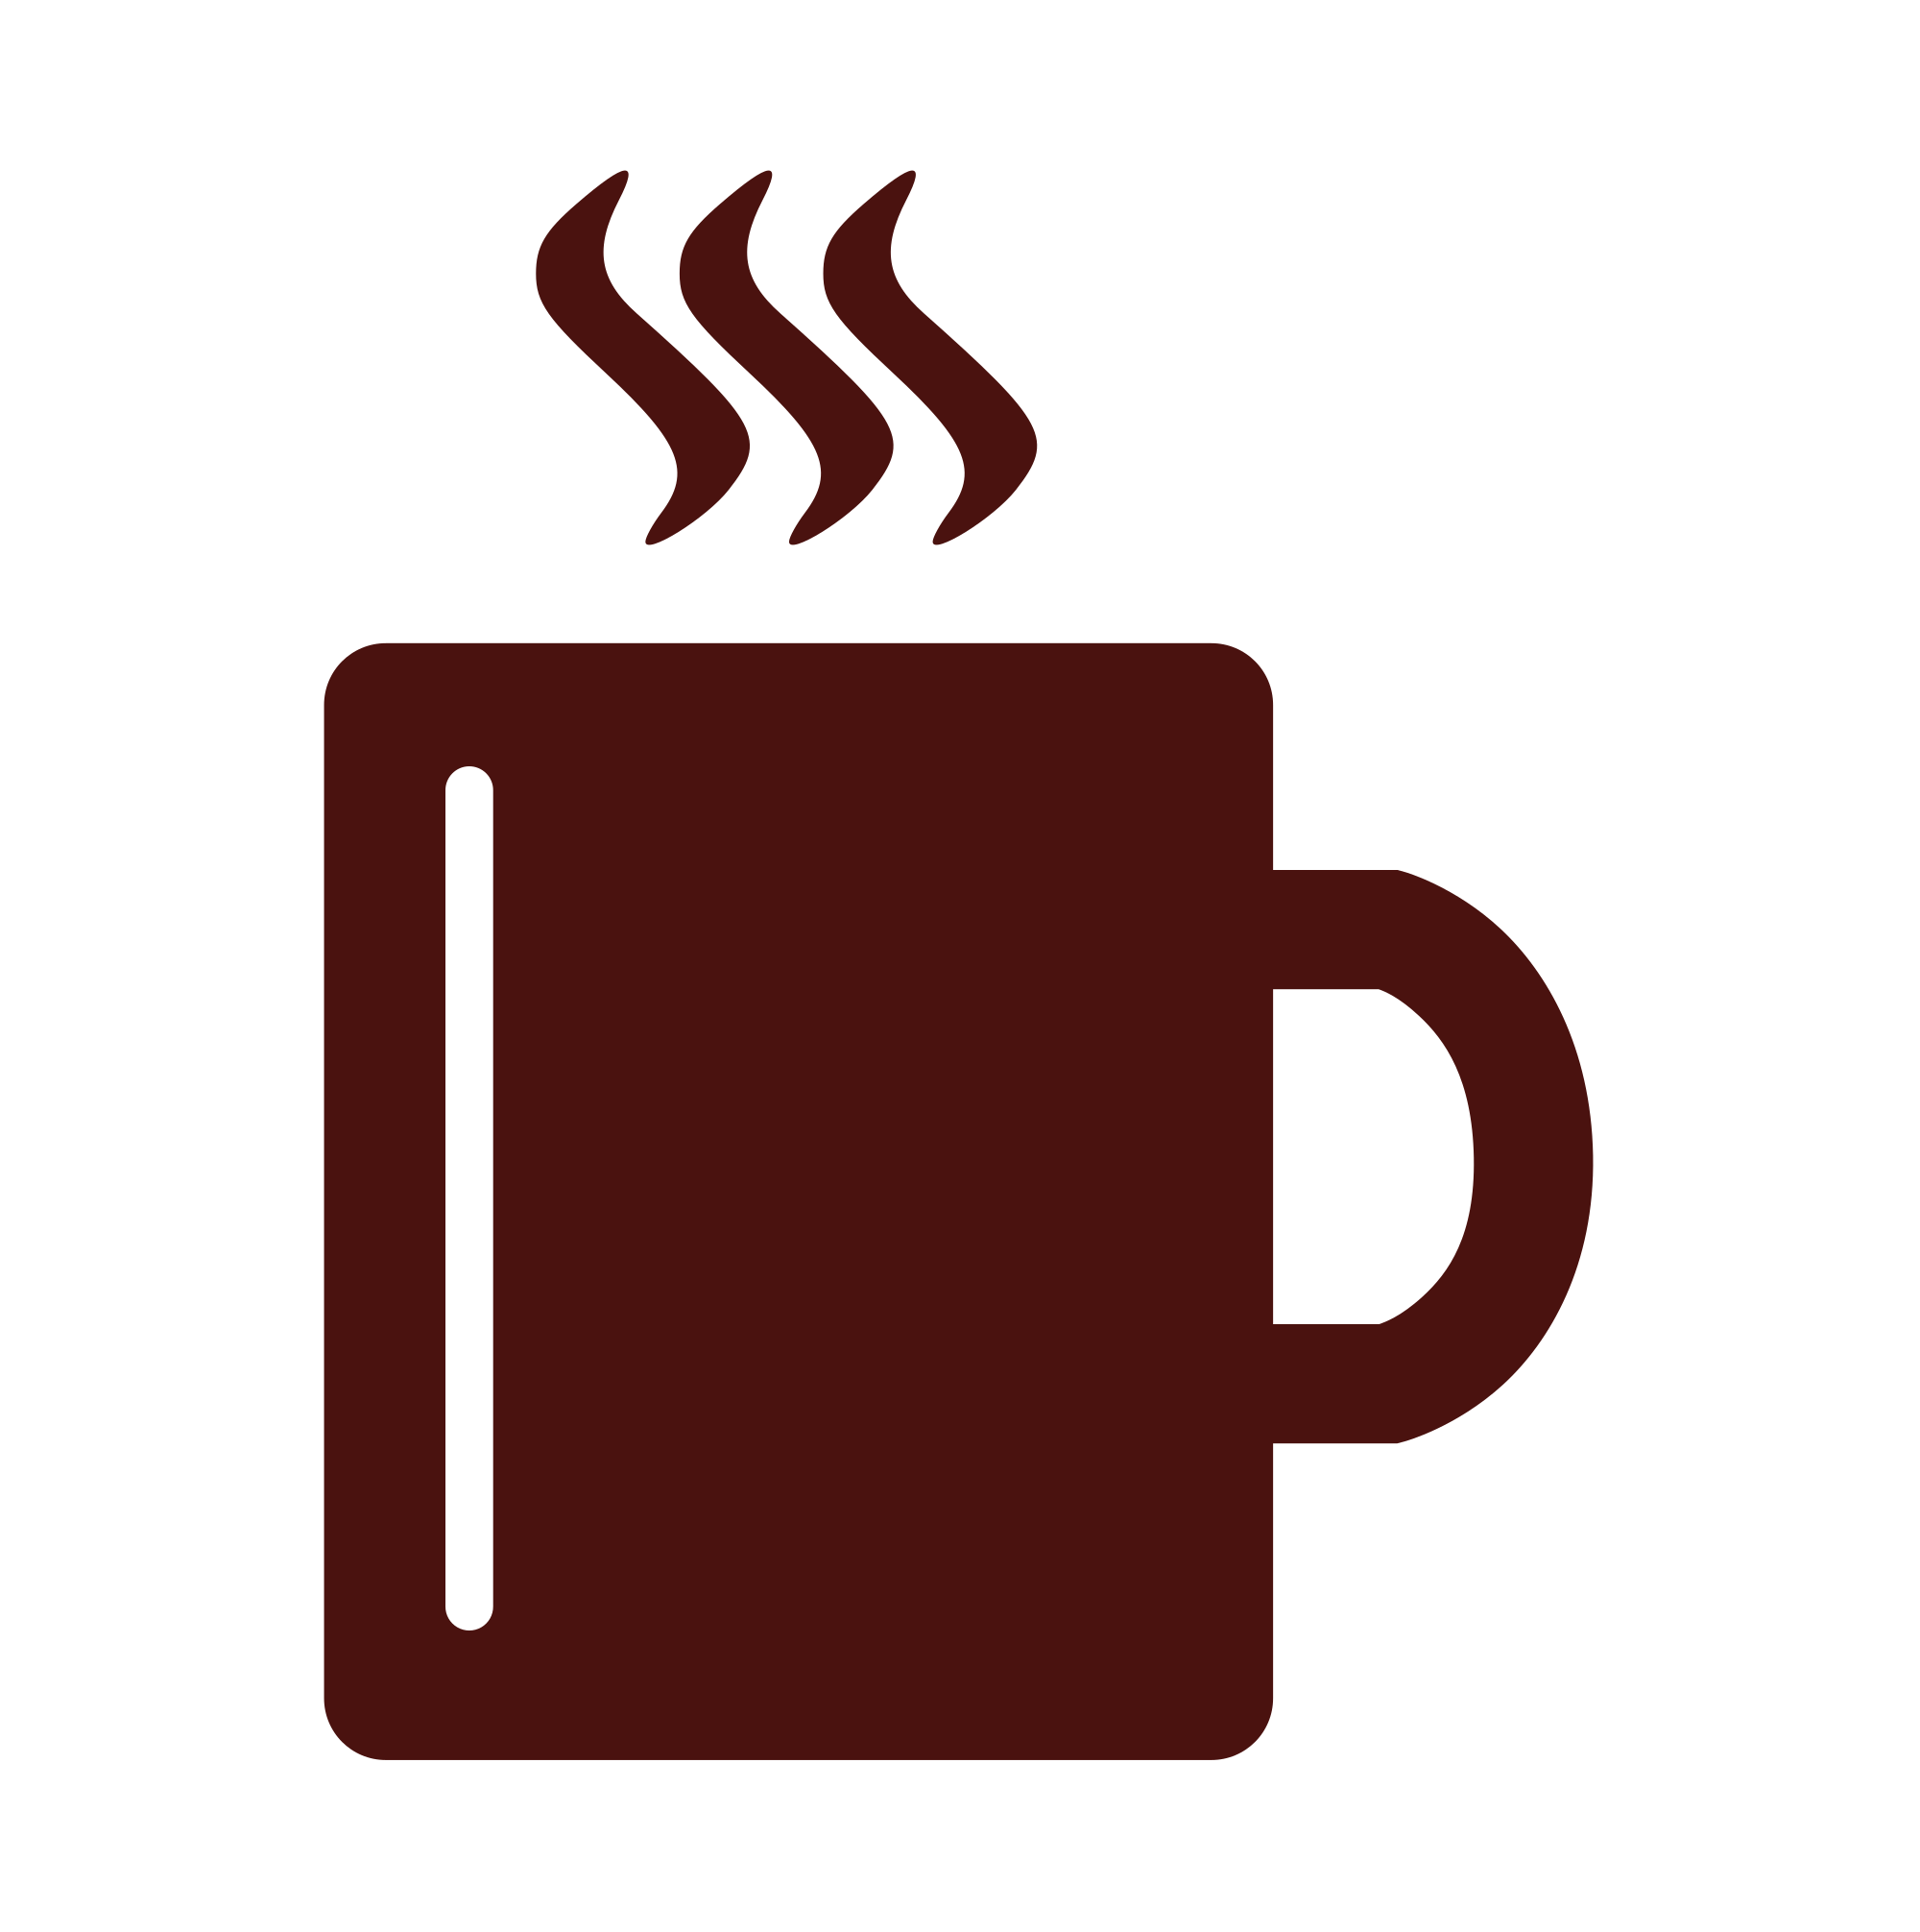 Cup clipart icon. File coffee mug flat